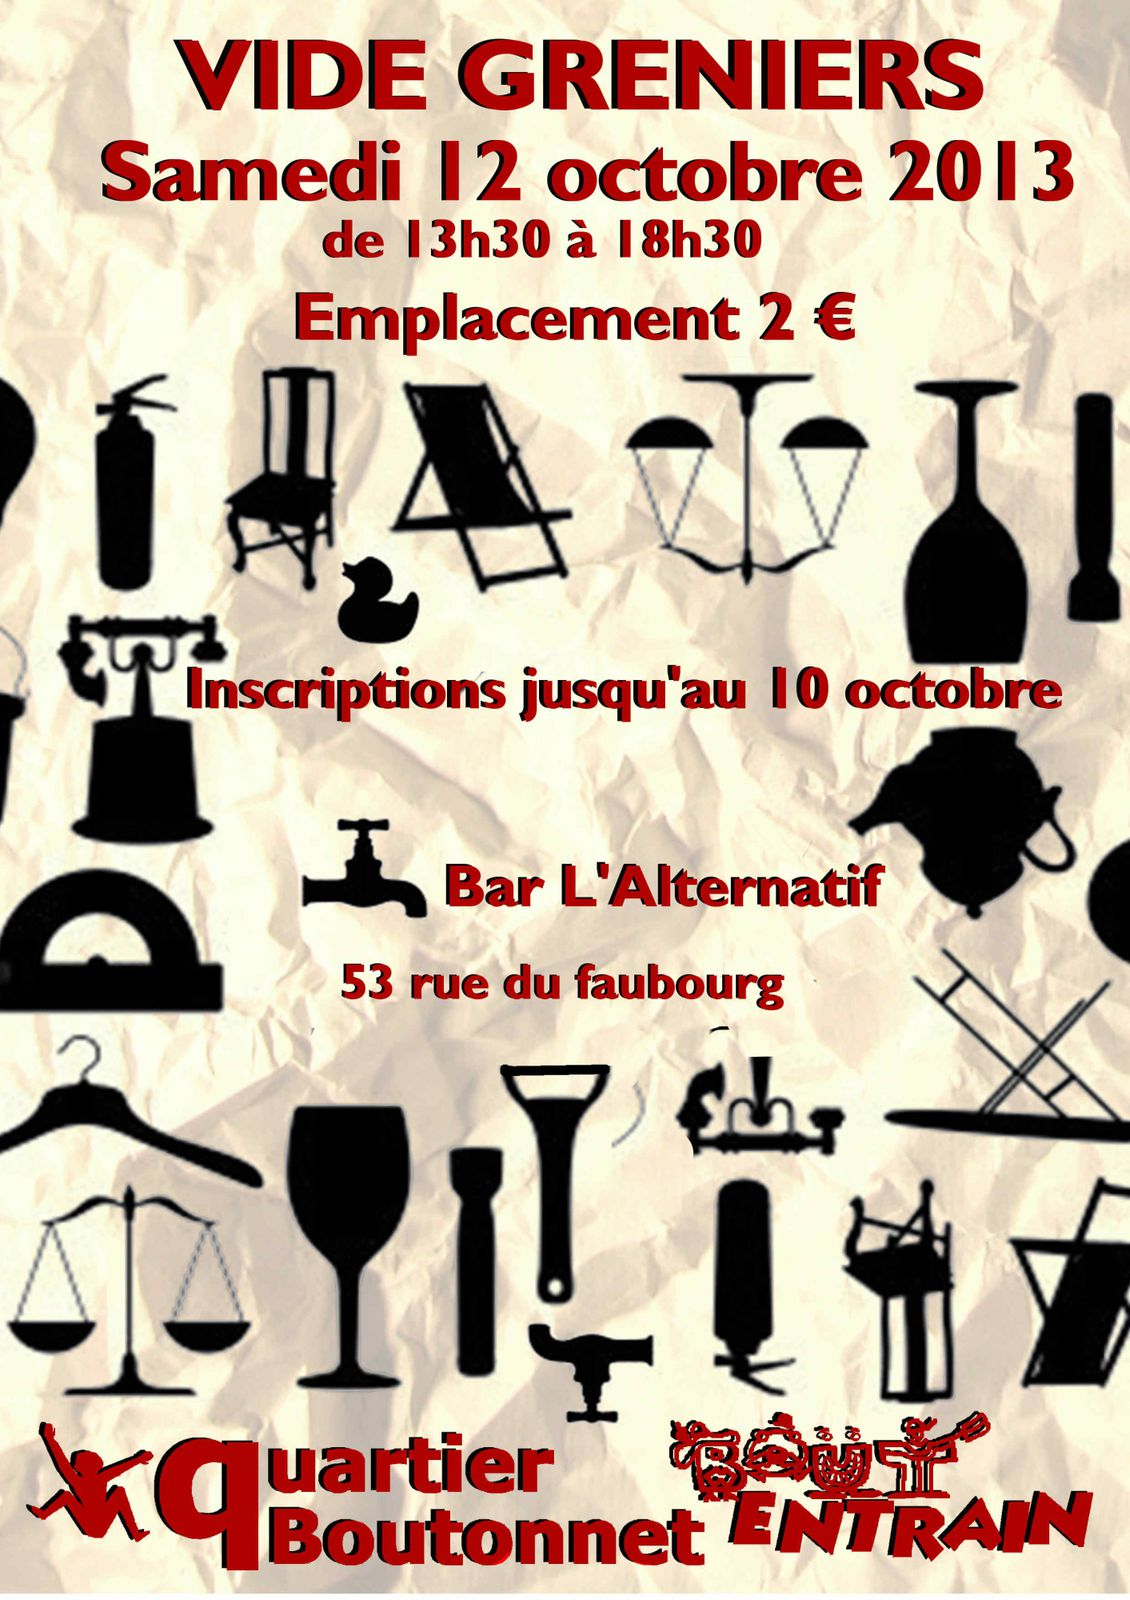 Samedi 12 octobre : VIDE-GRENIER à Boutonnet